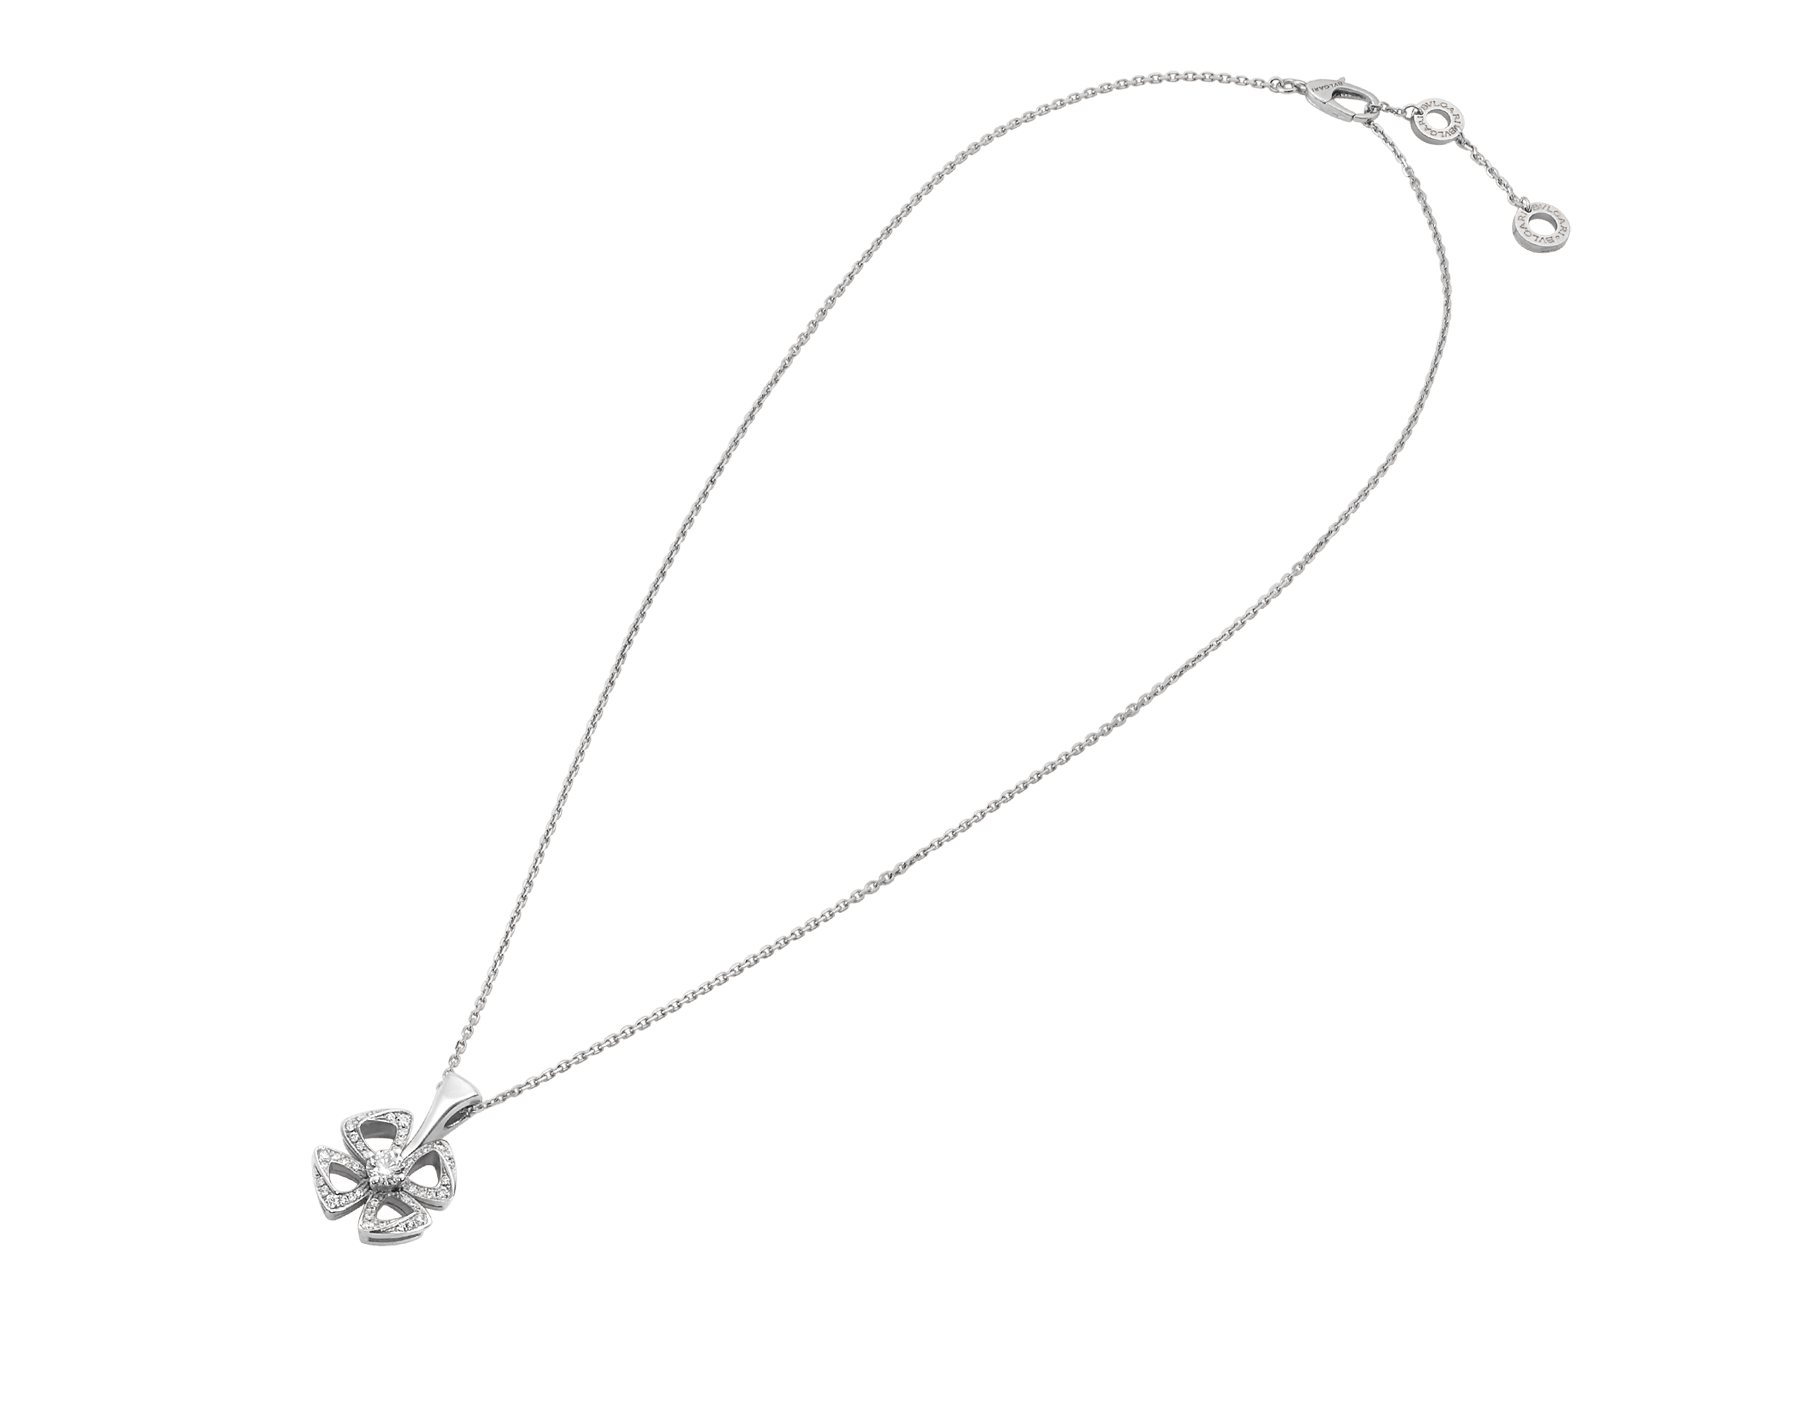 Fiorever 18K 白金項鍊,鑲飾 1 顆明亮型切割鑽石(0.10 克拉)和密鑲鑽石(0.06 克拉)。 358157 image 2